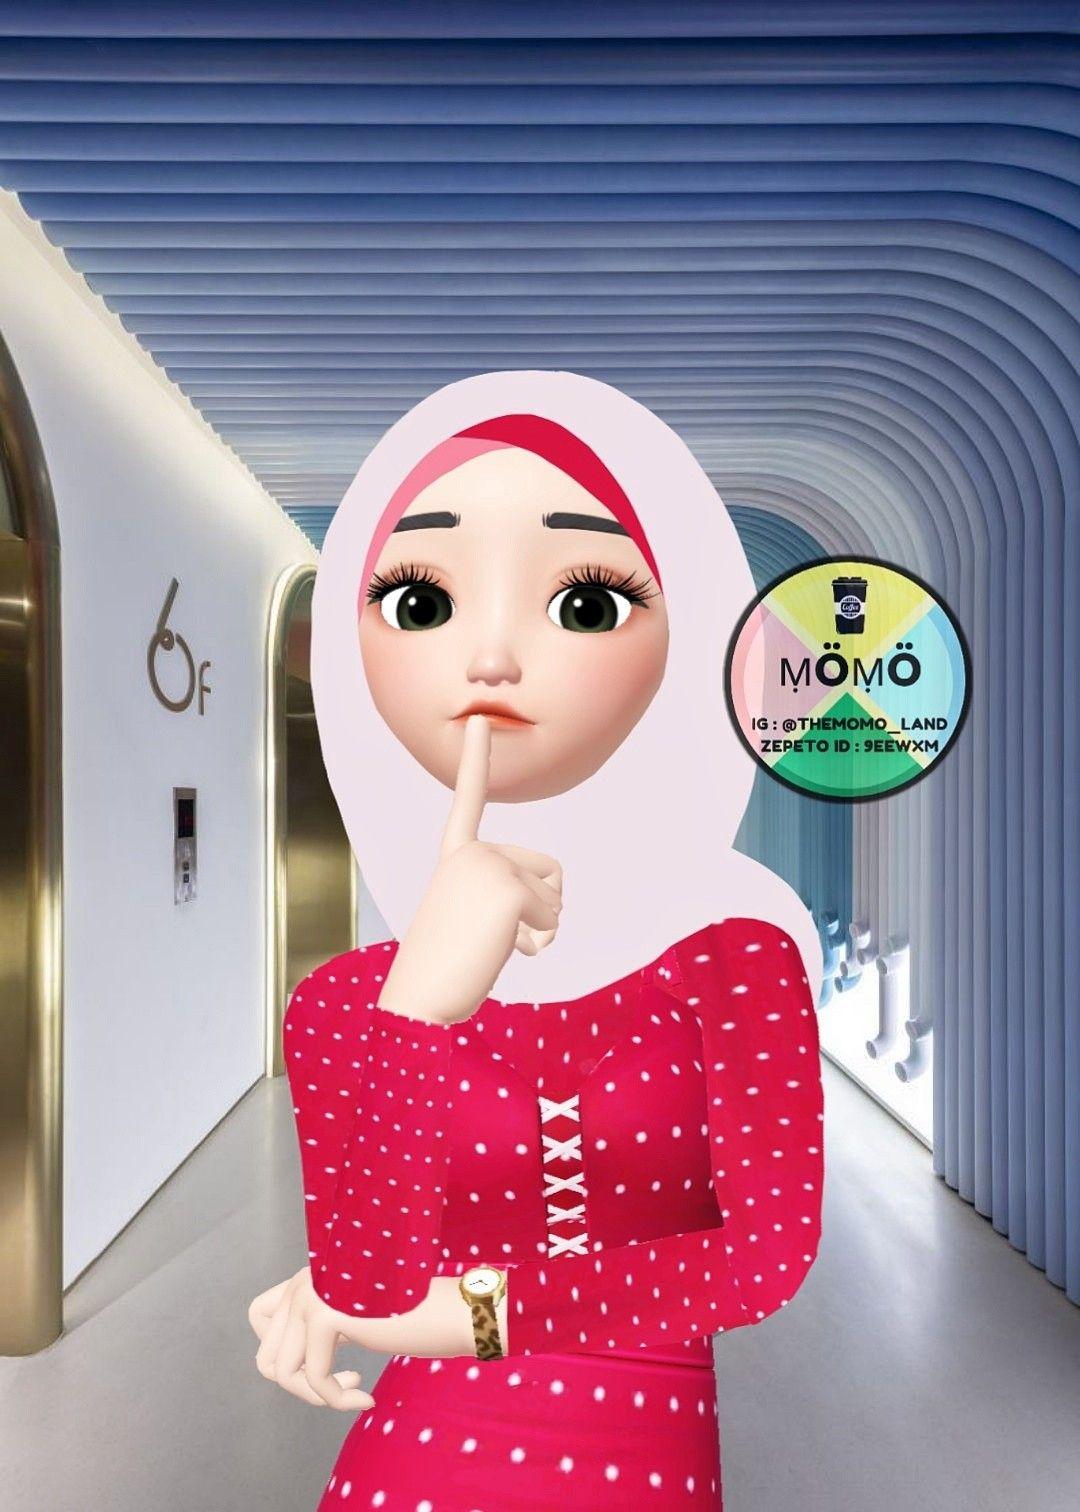 Pin oleh Izza Dhia di Muslimah Zepeto Kartun, Gadis